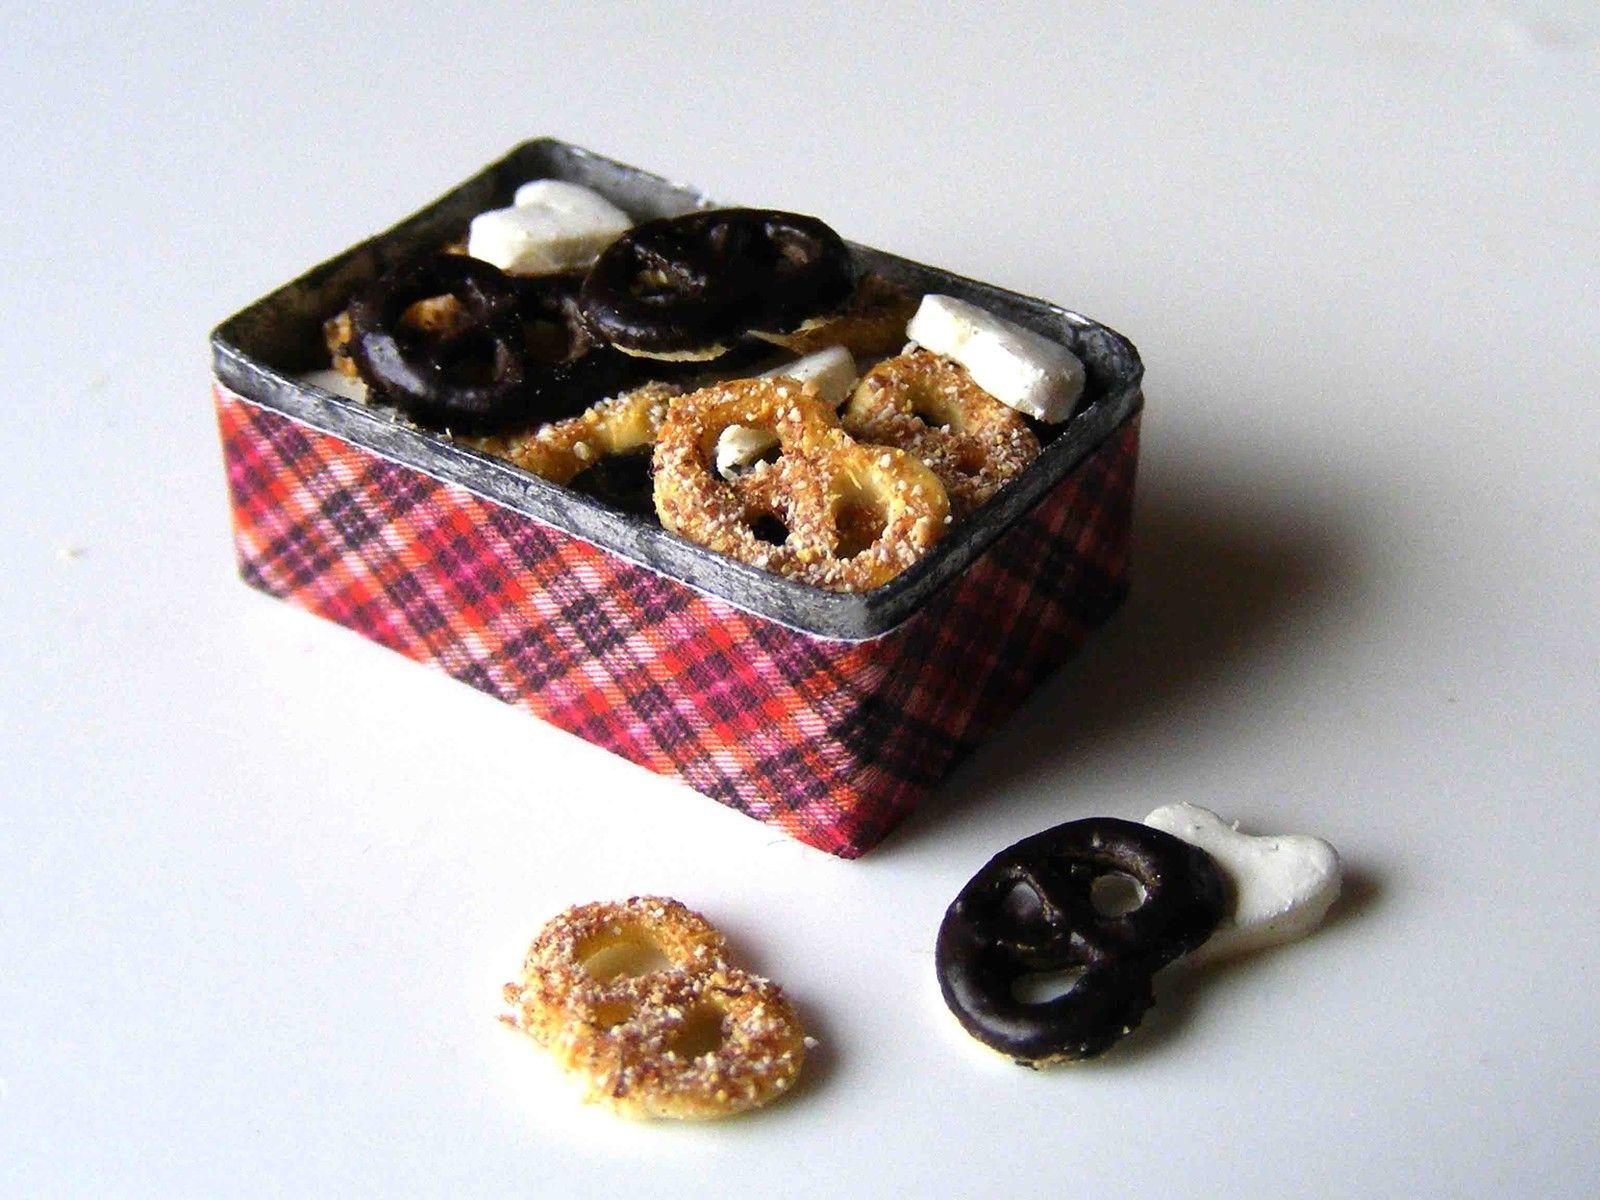 Pretzel and heart cookies - Miniature in 1:12 by Erzsébet Bodzás, IGMA Artisan